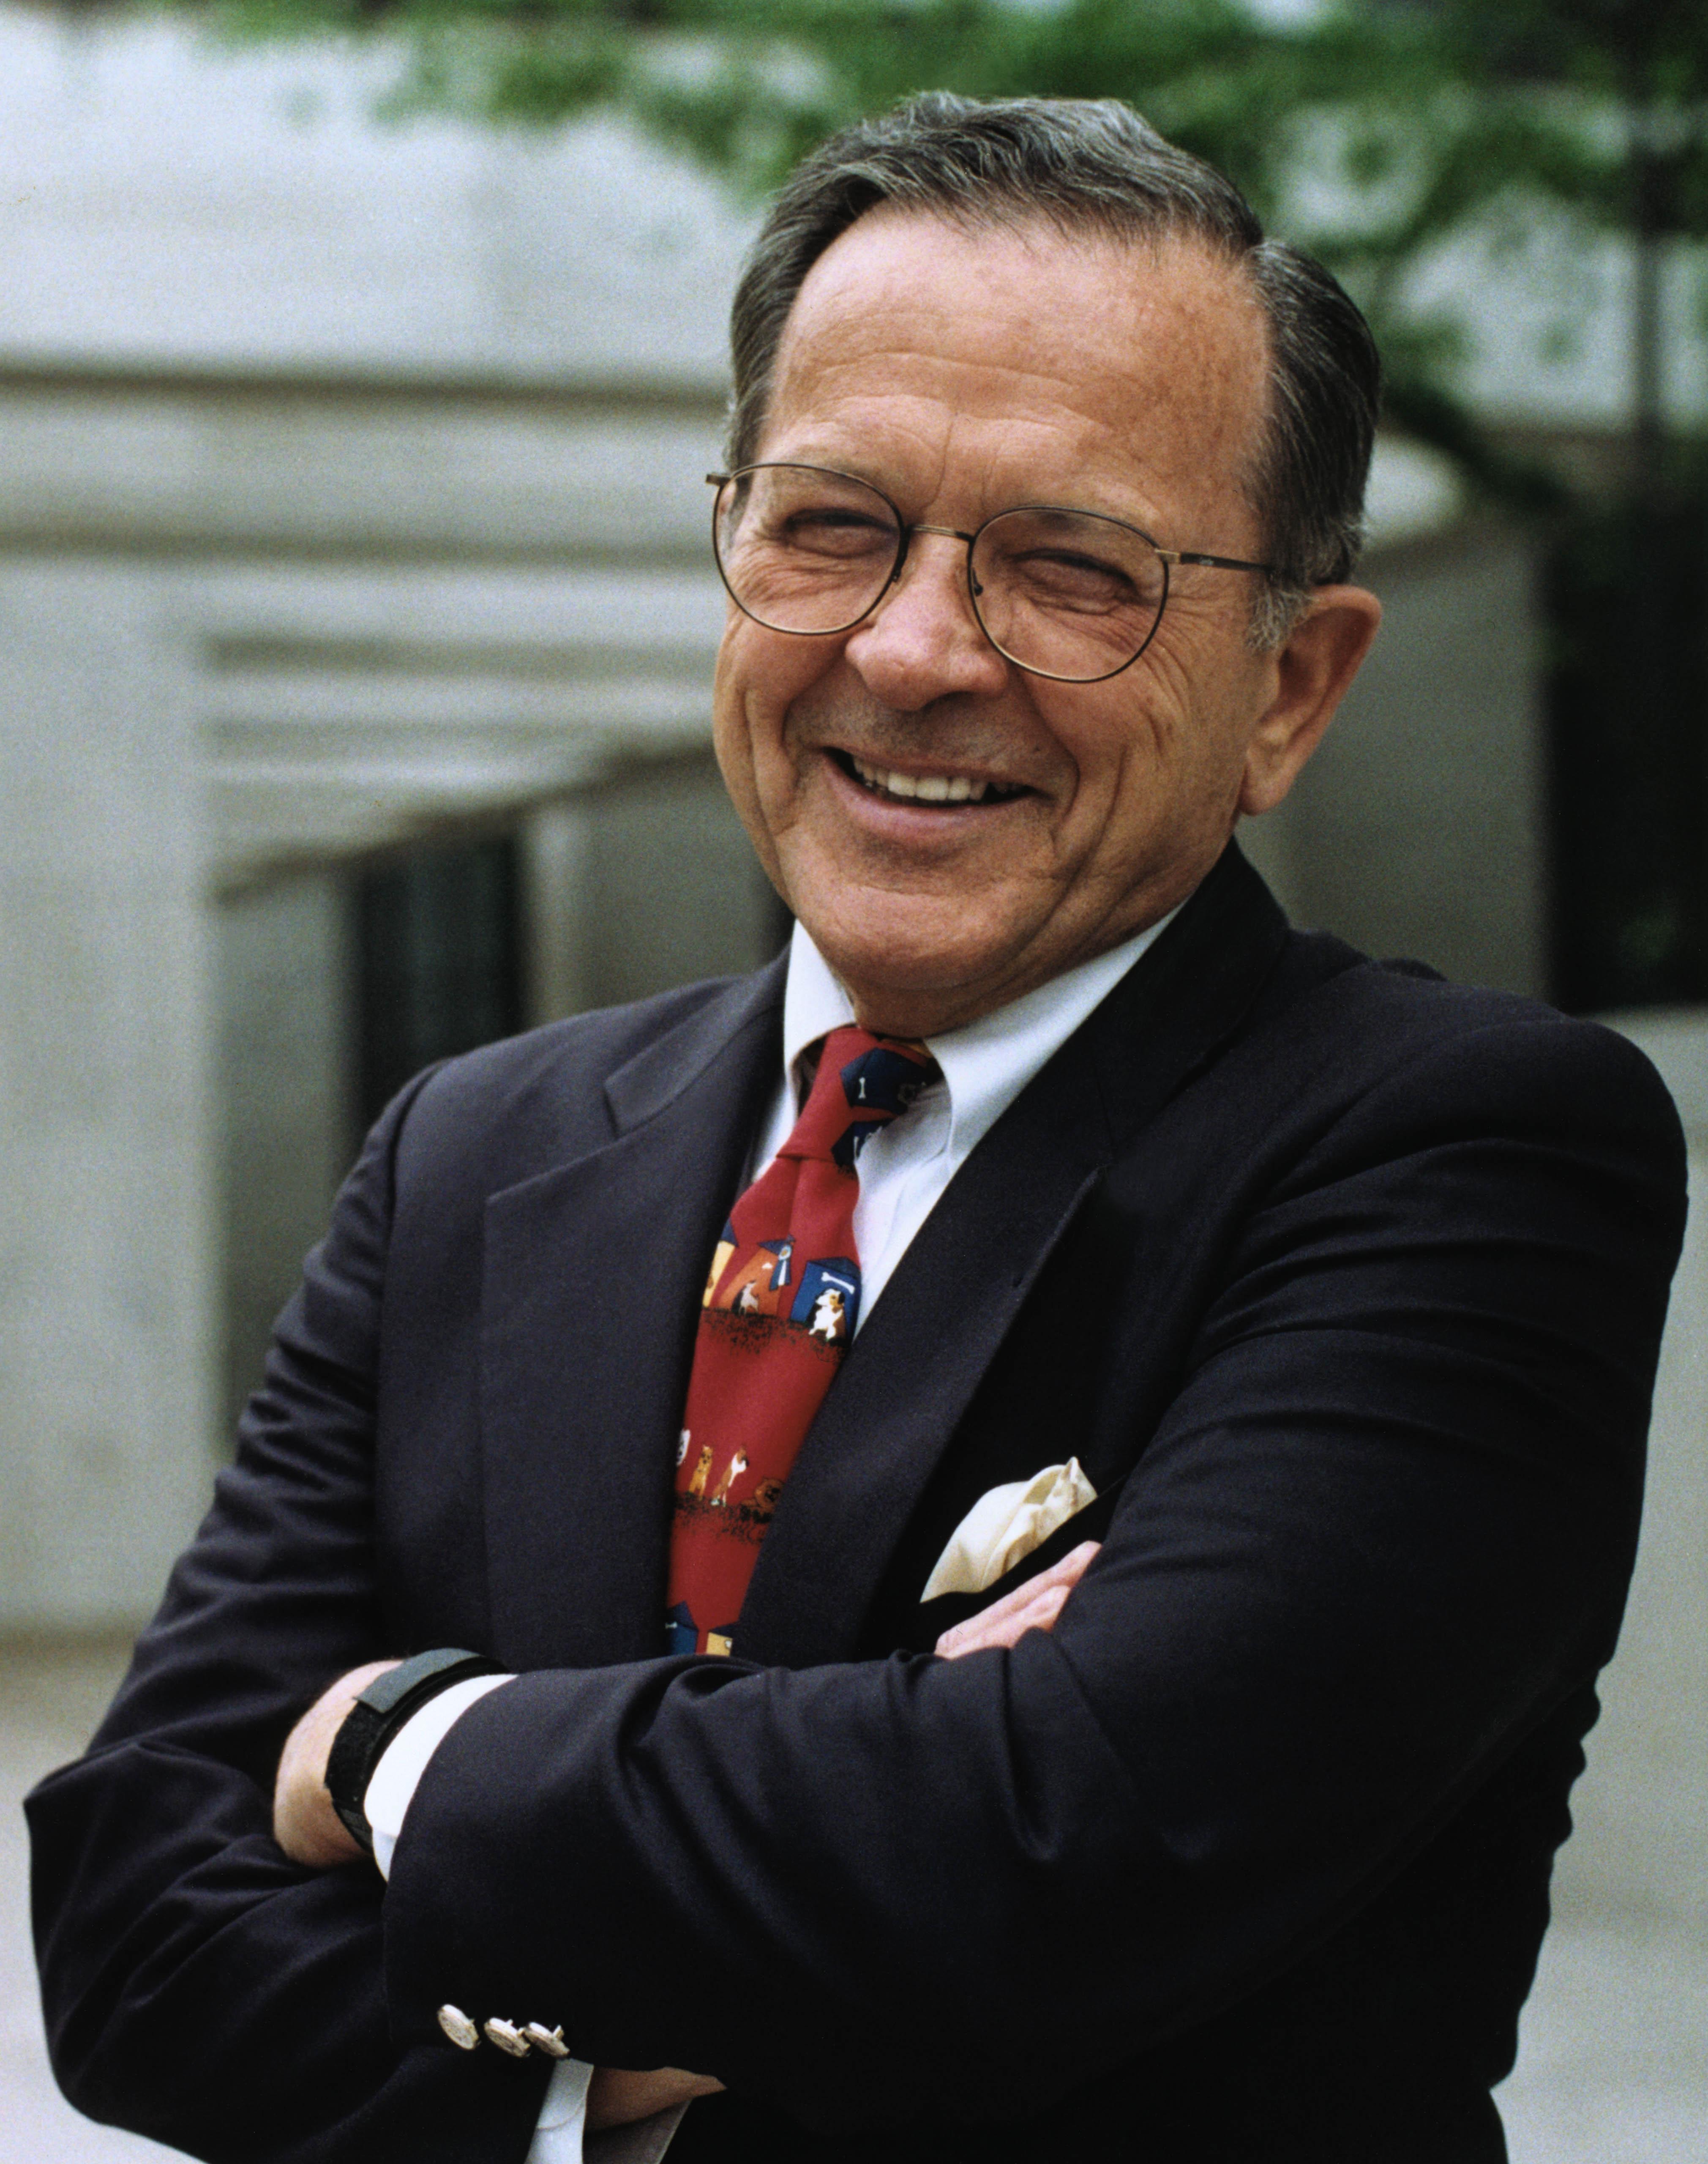 Stevens in 1997